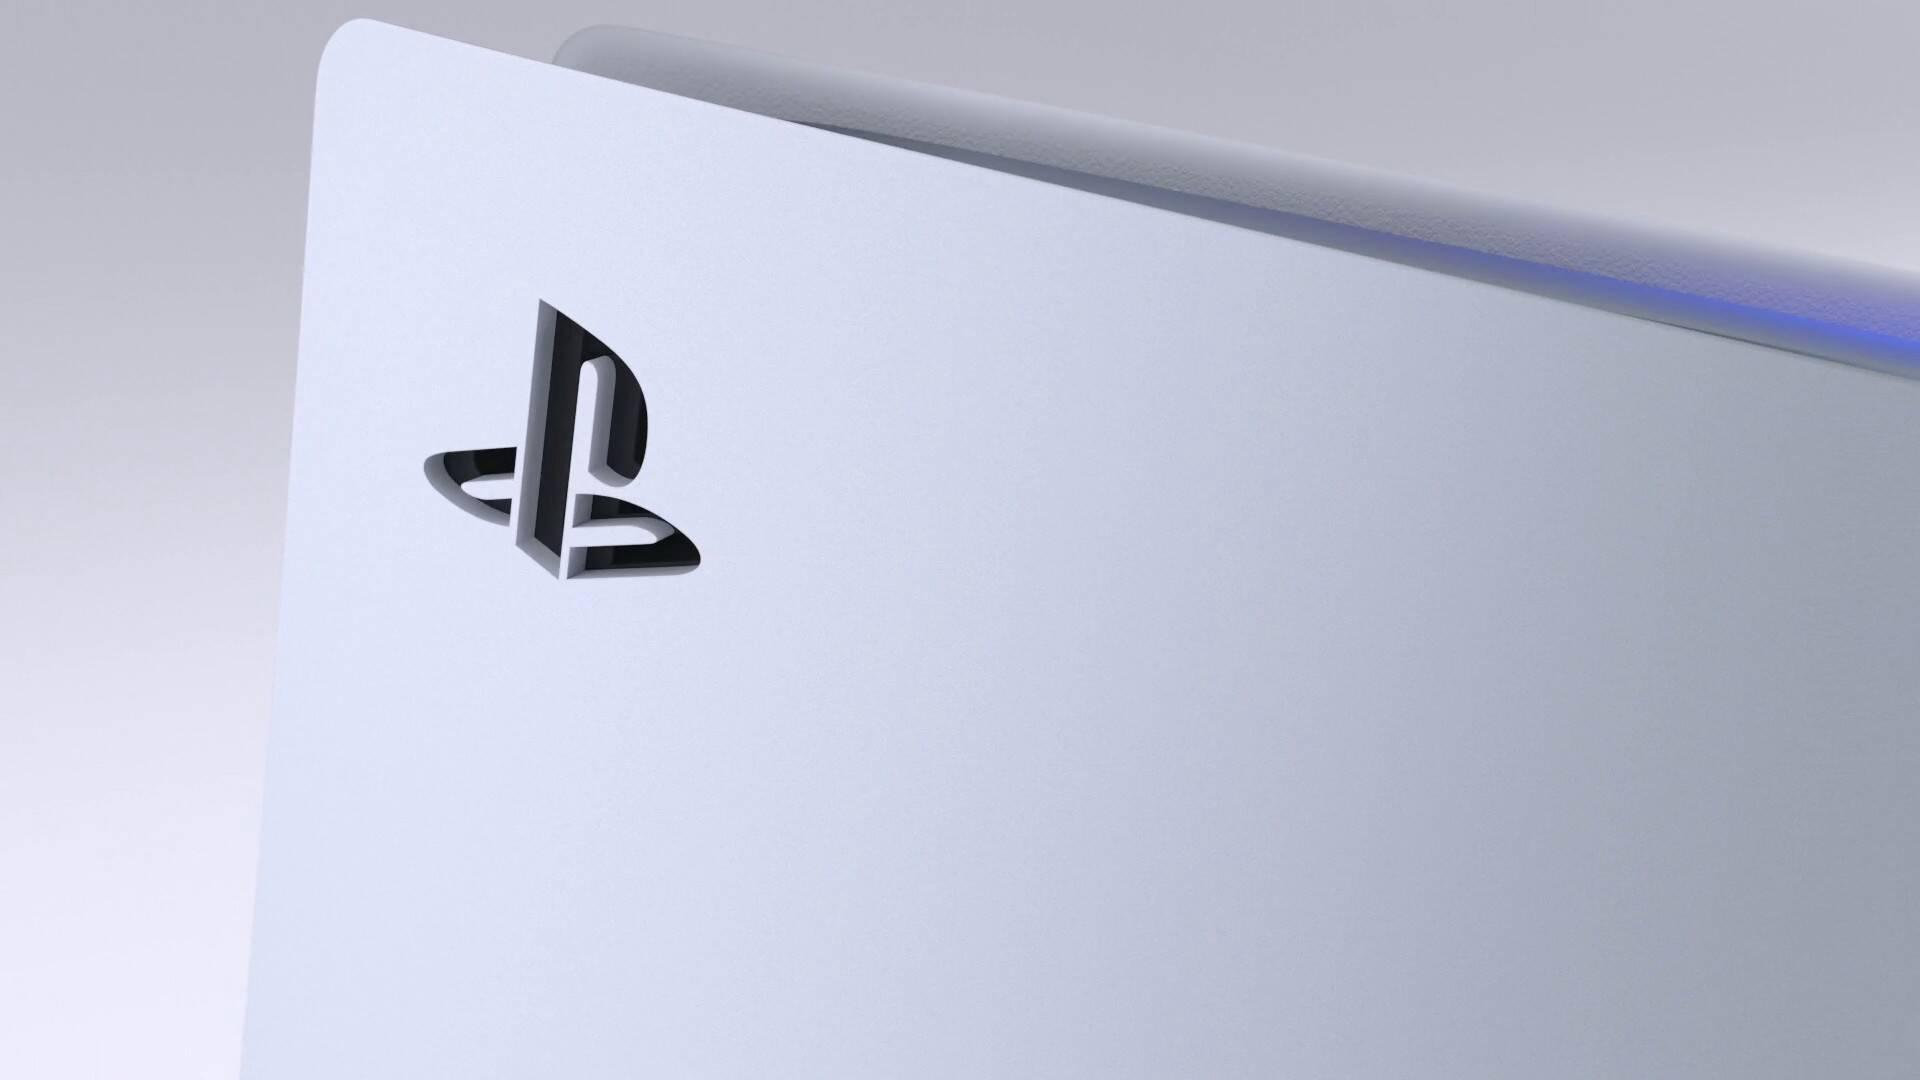 PlayStation 5 - logo